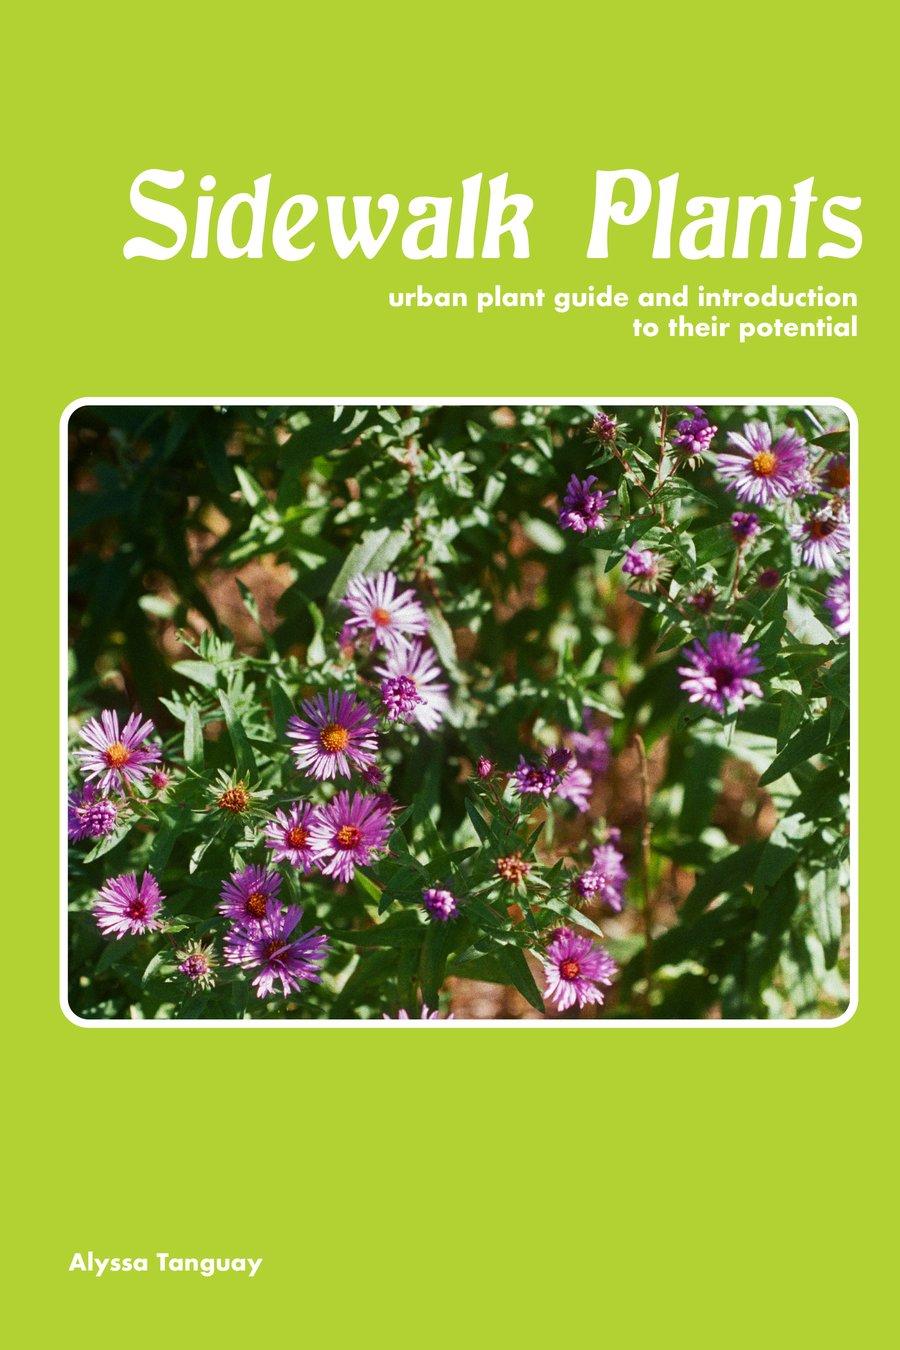 Image of Sidewalk Plants (manufacturing defect)